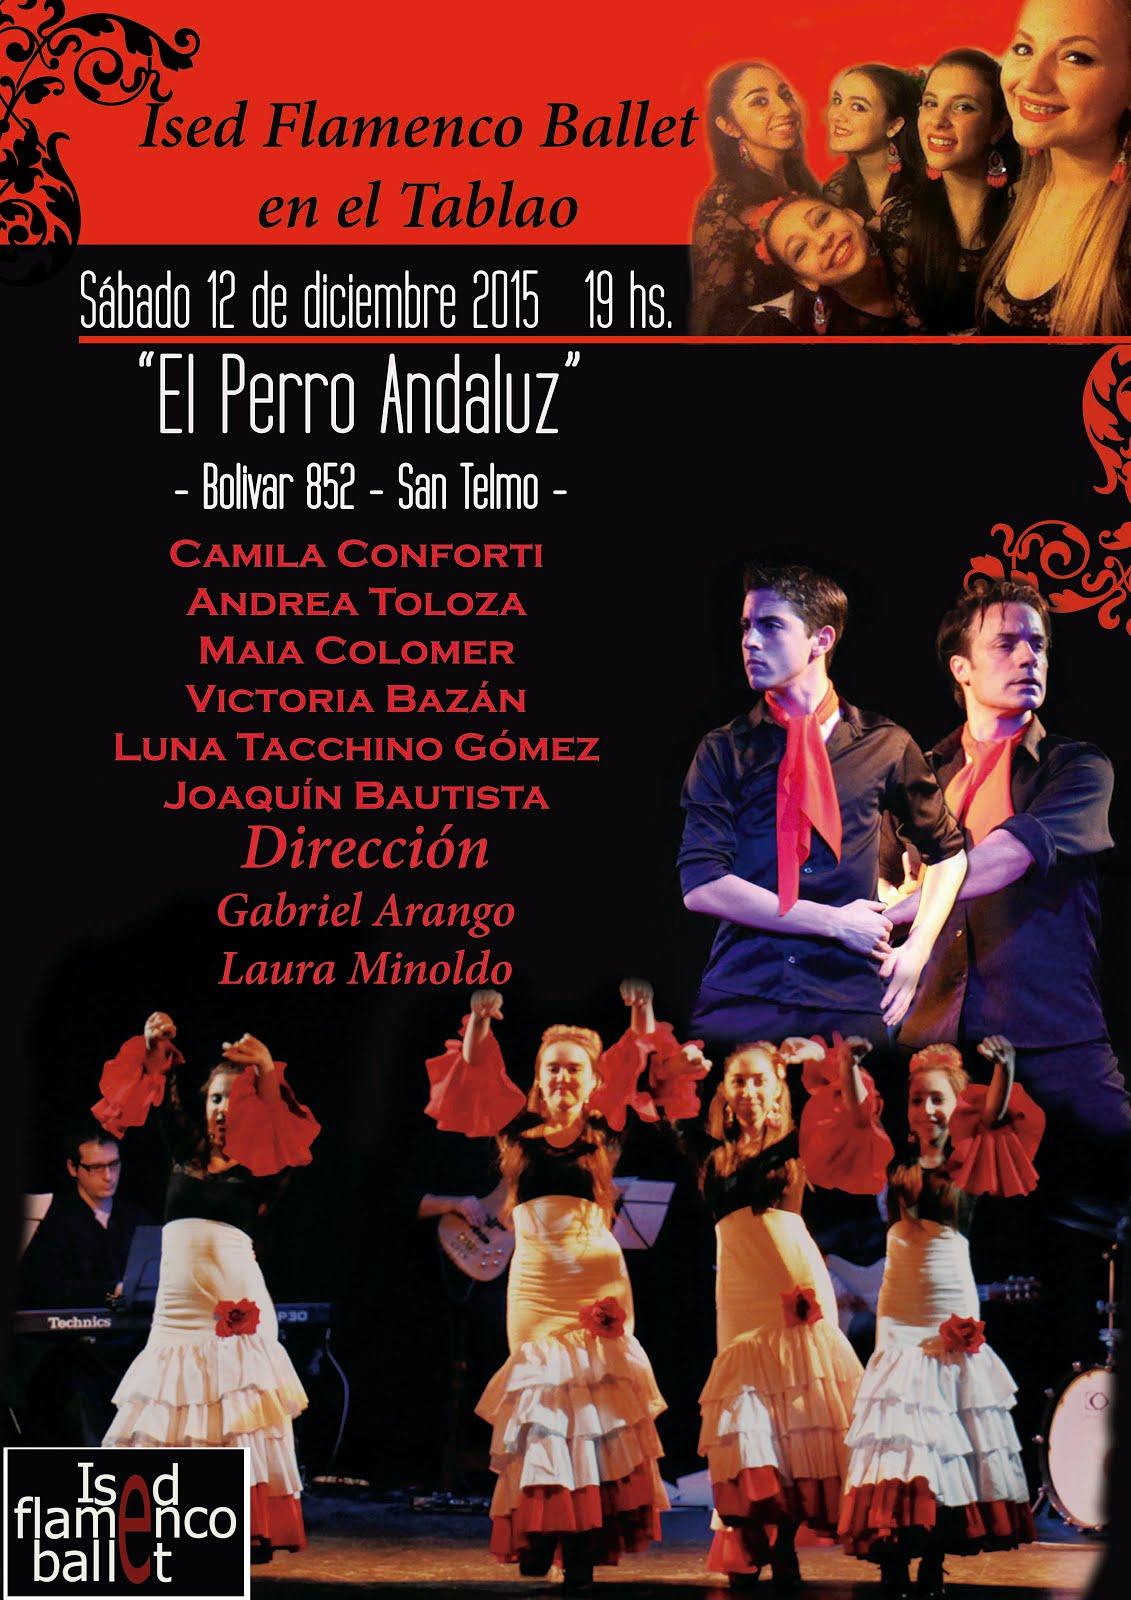 El Perro Andaluz 12/12/2015